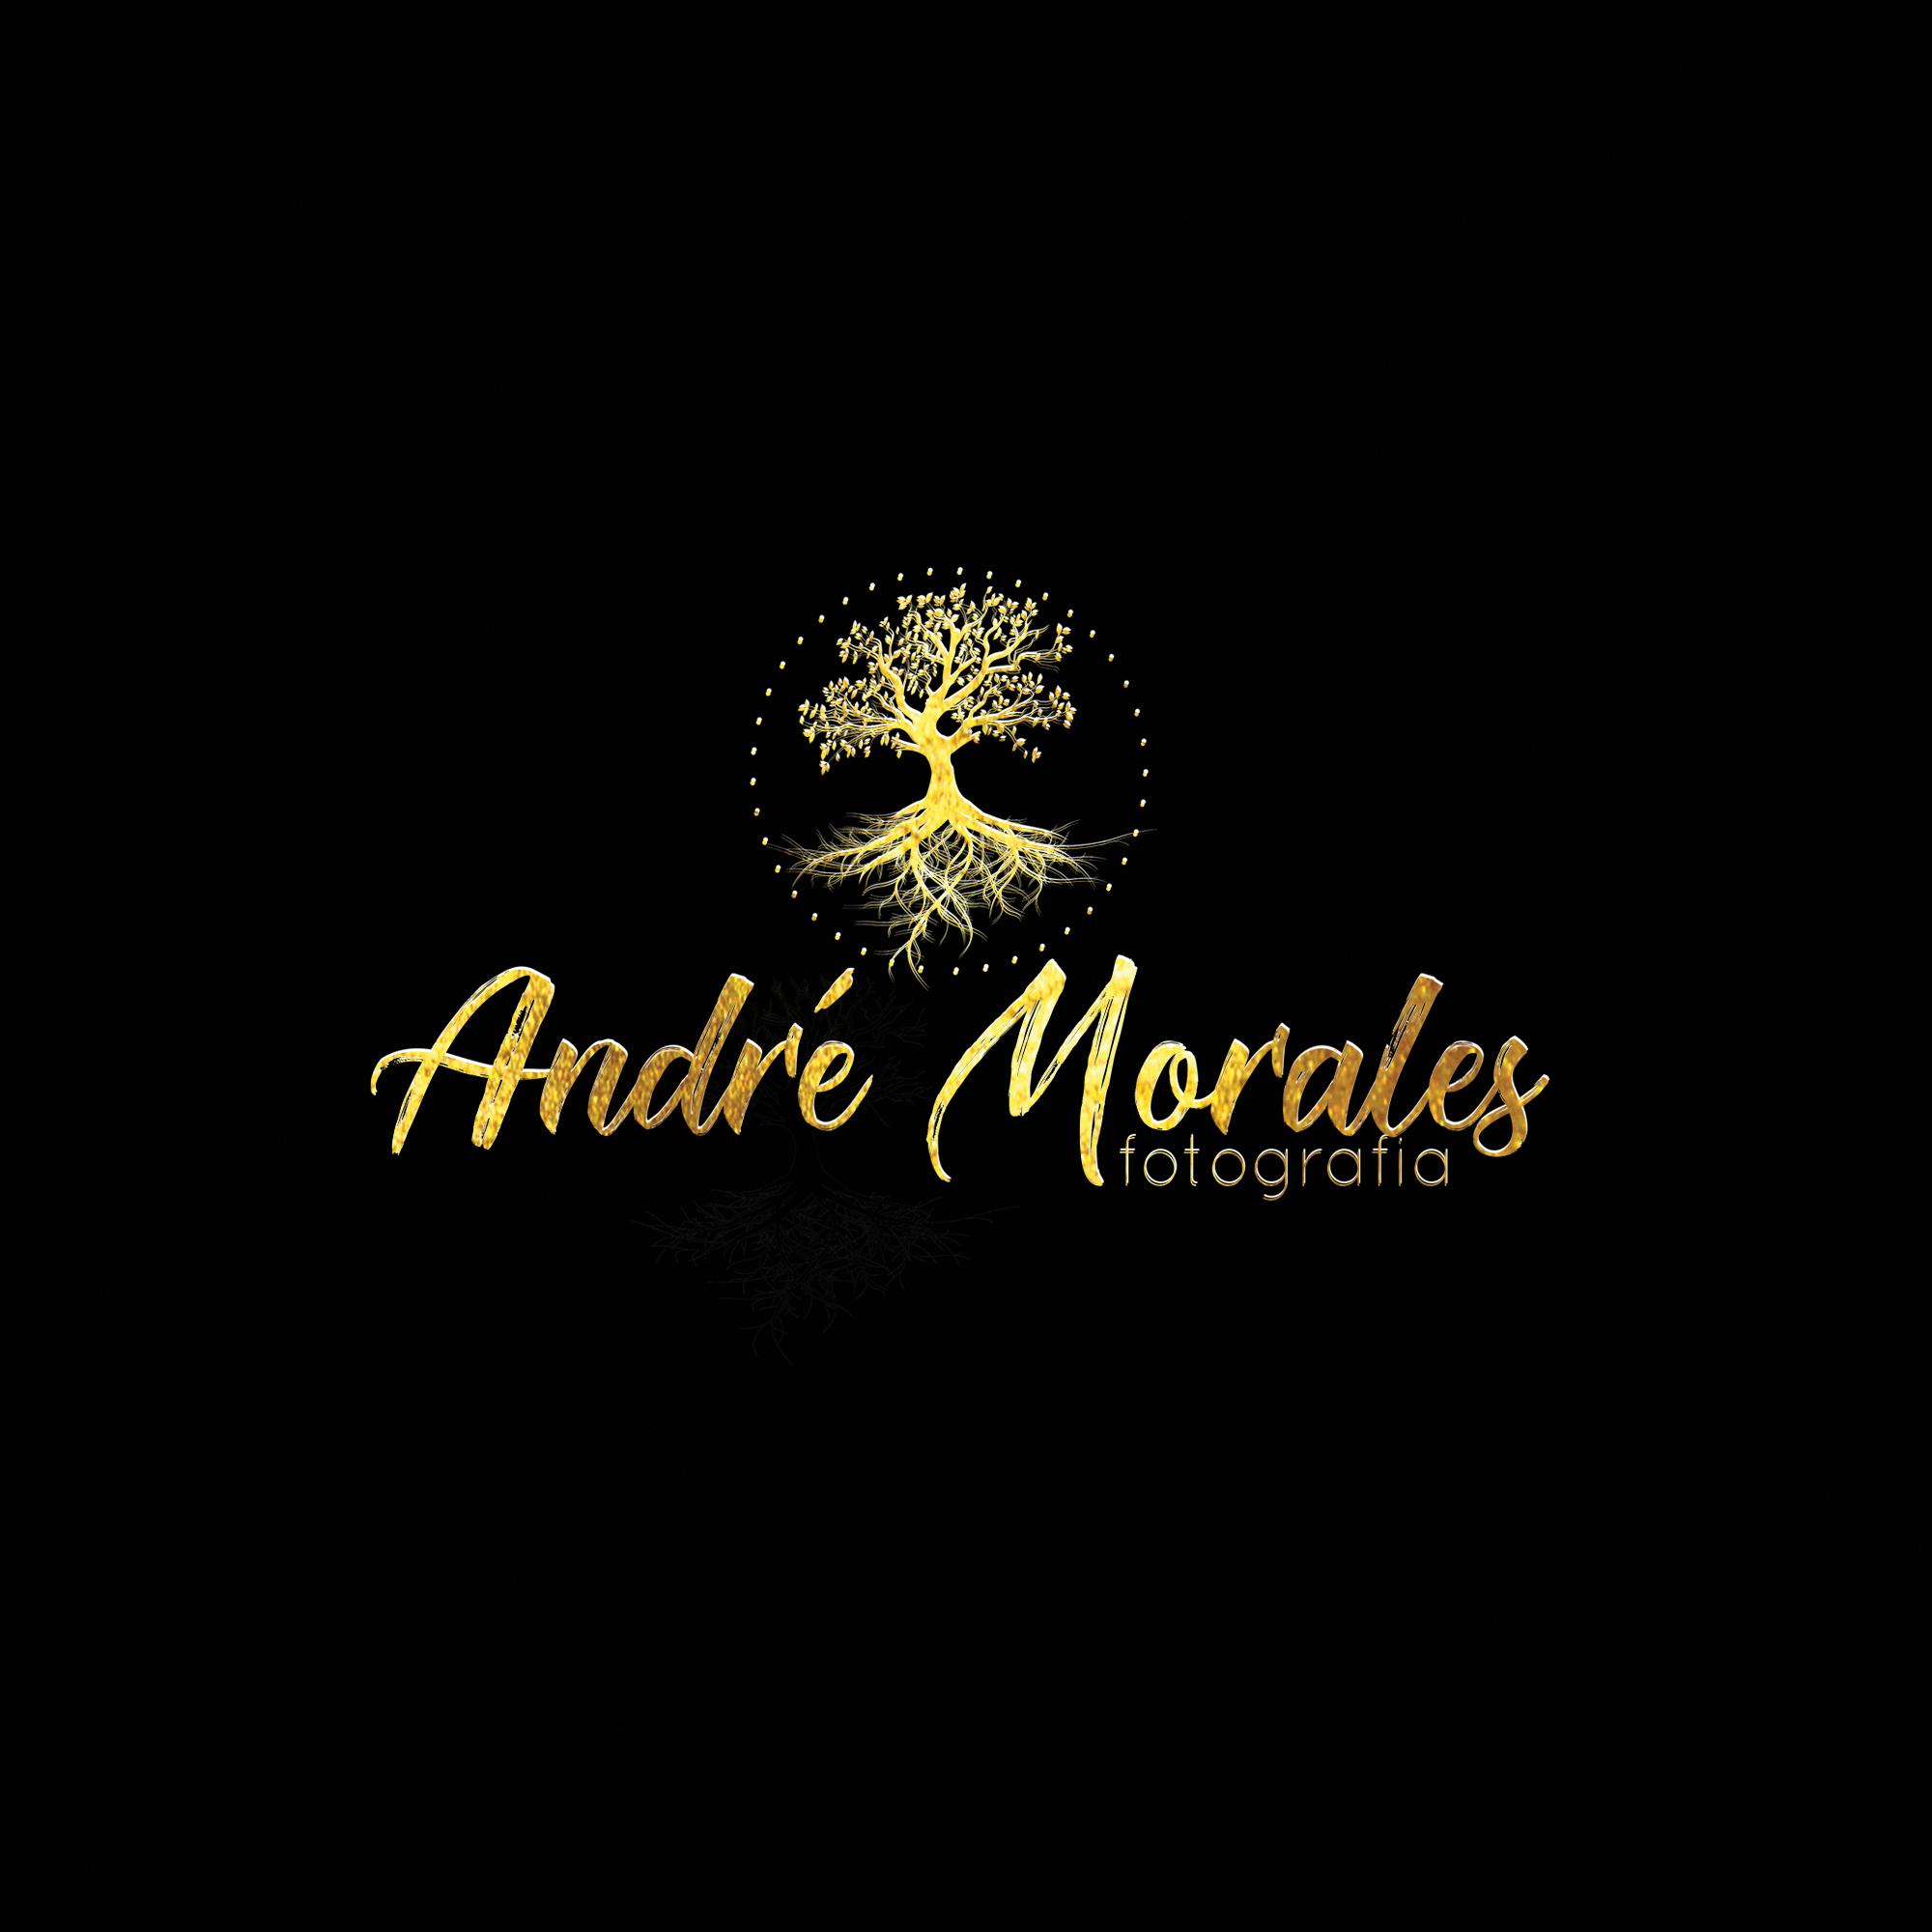 Contate André Morales Fotógrafo - Ensaio Fotográfico Sorocaba, Gestante, Feminino, Casamento ...